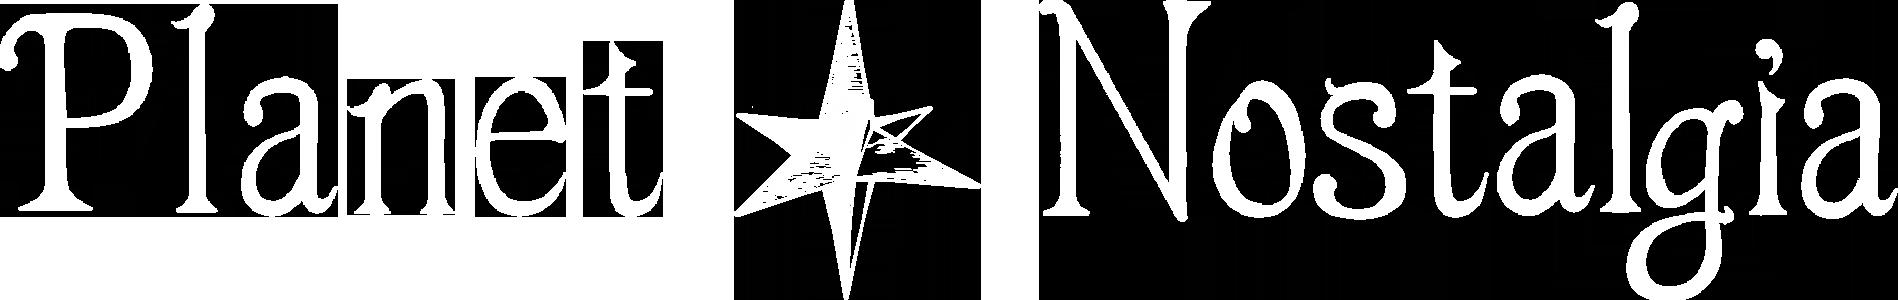 Planet Nostalgia(プラネットノスタルジア)ノスタルジックなモチーフアクセサリー